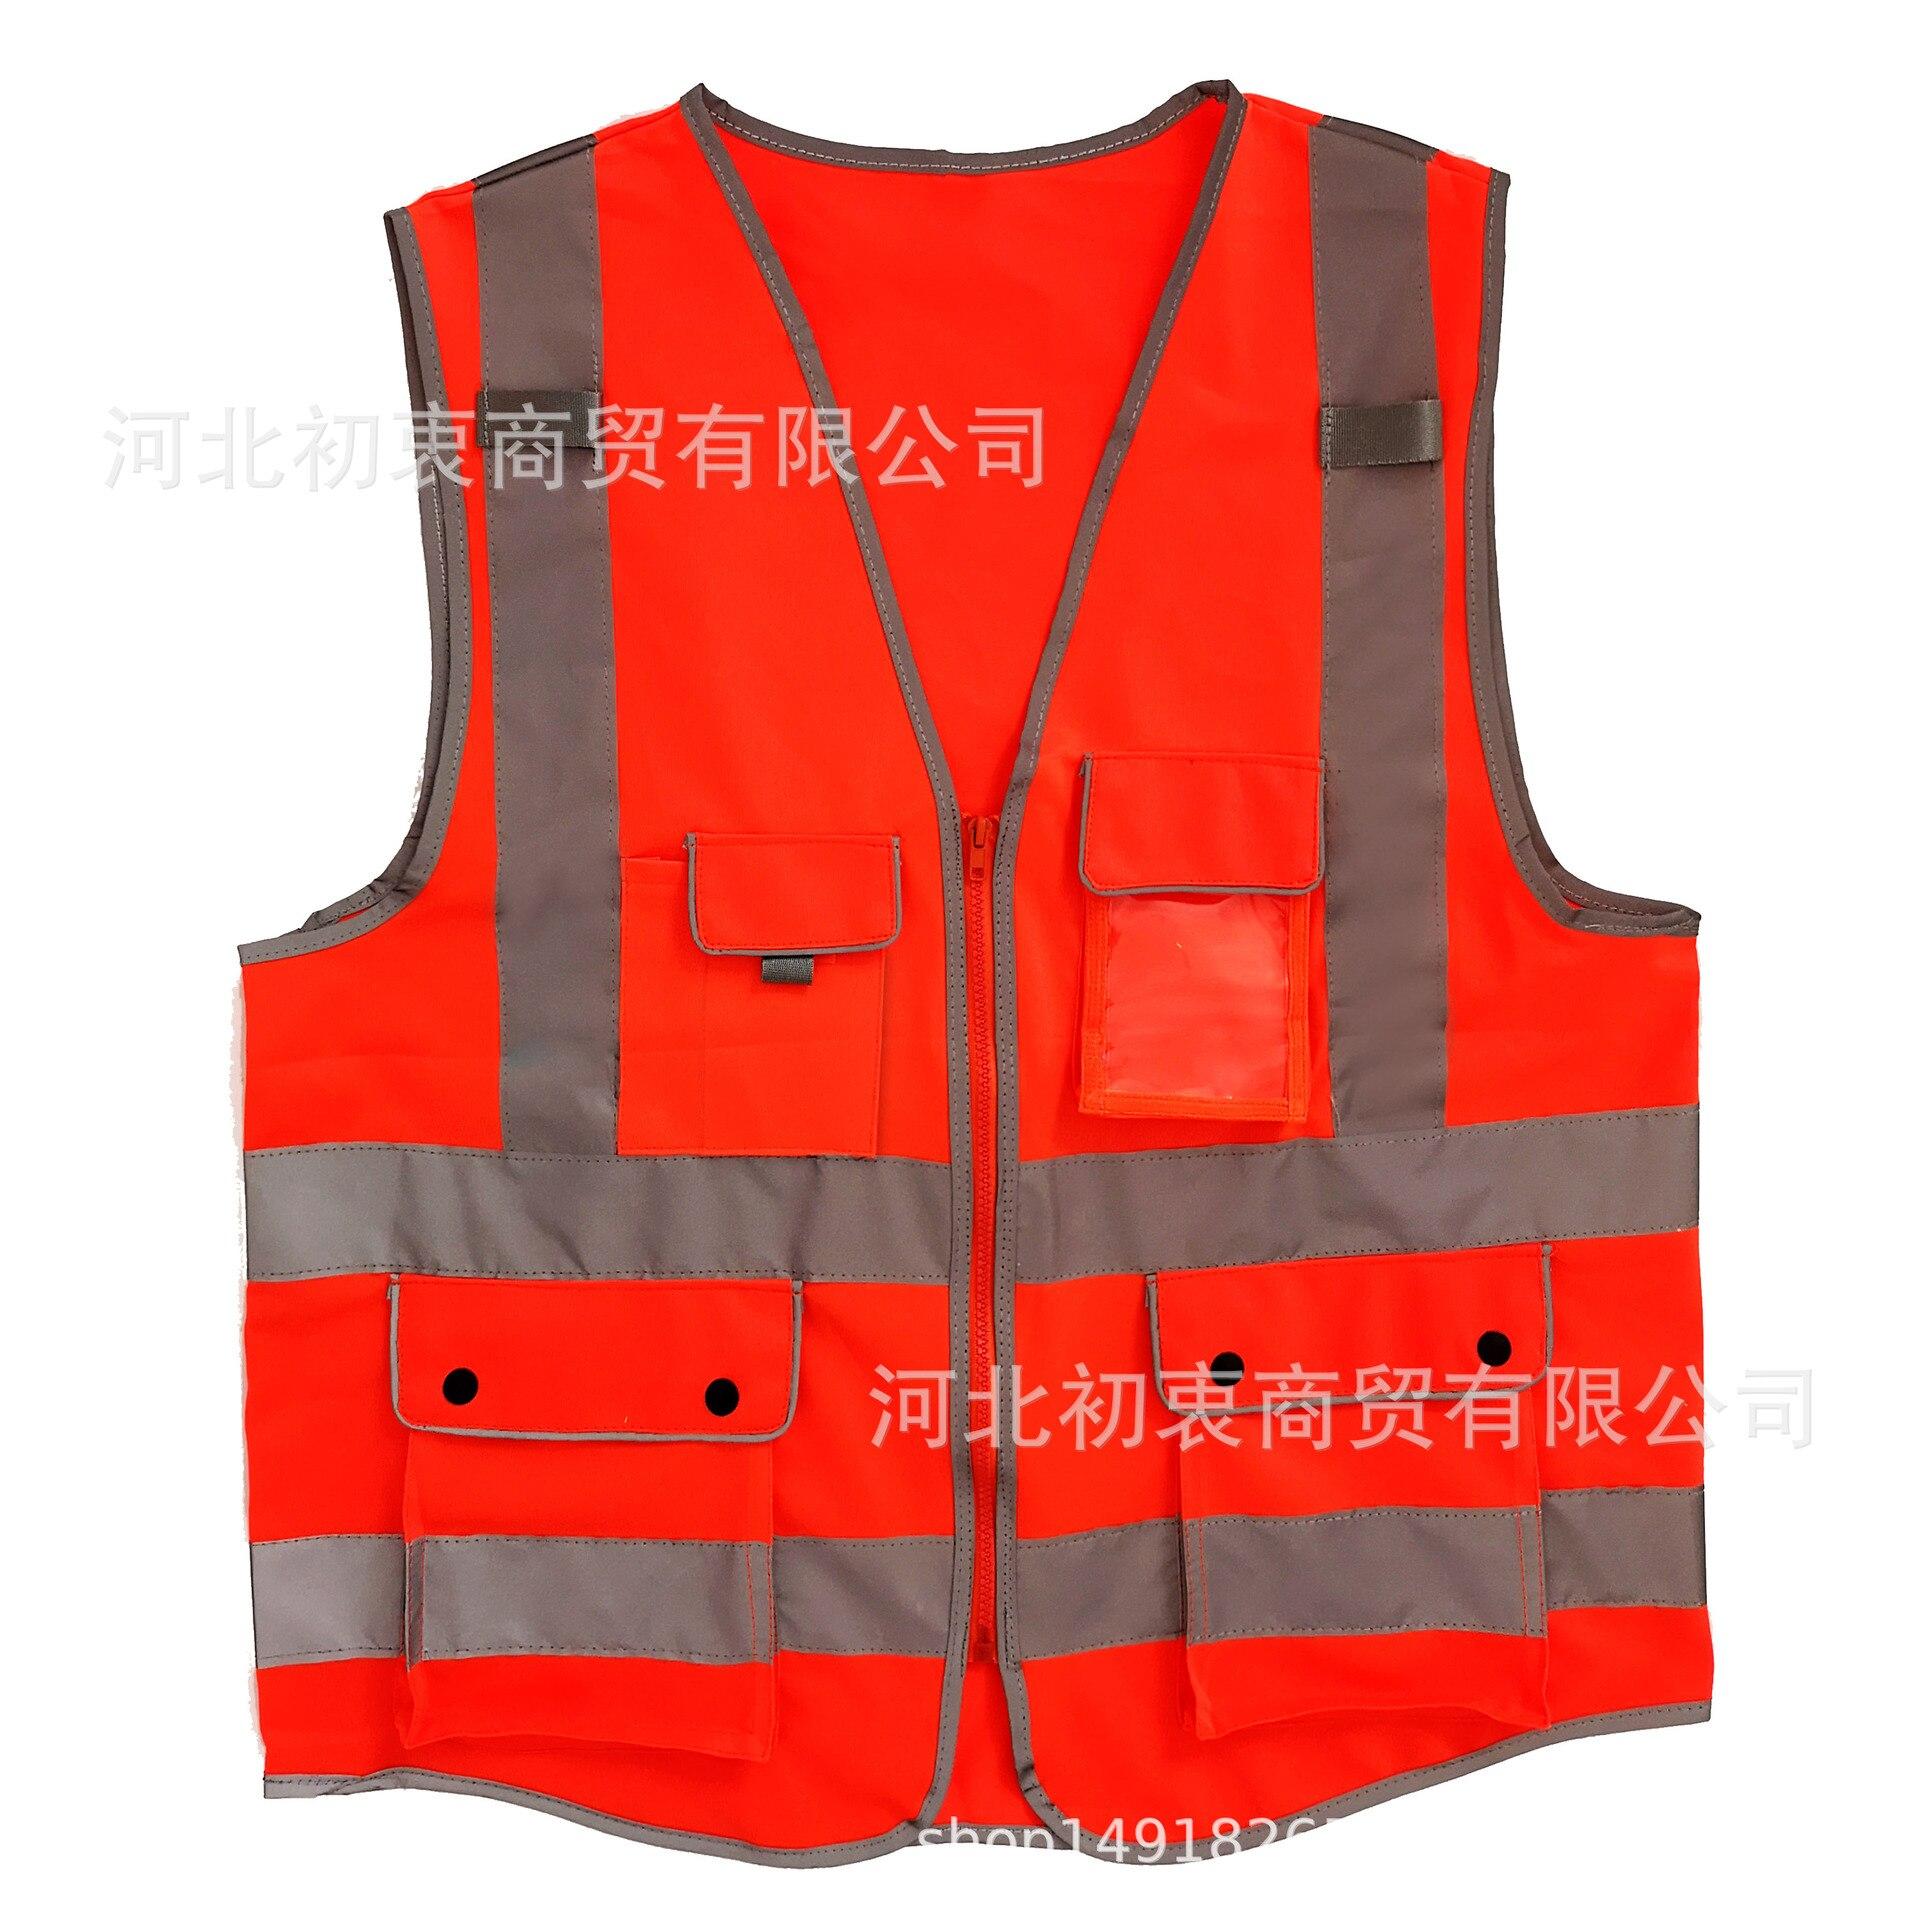 Reflective Vest Architecture Work Site Homework Safe Protection Coat Traffic Green Fluorescent Clothes Coat Reflective Waistcoat